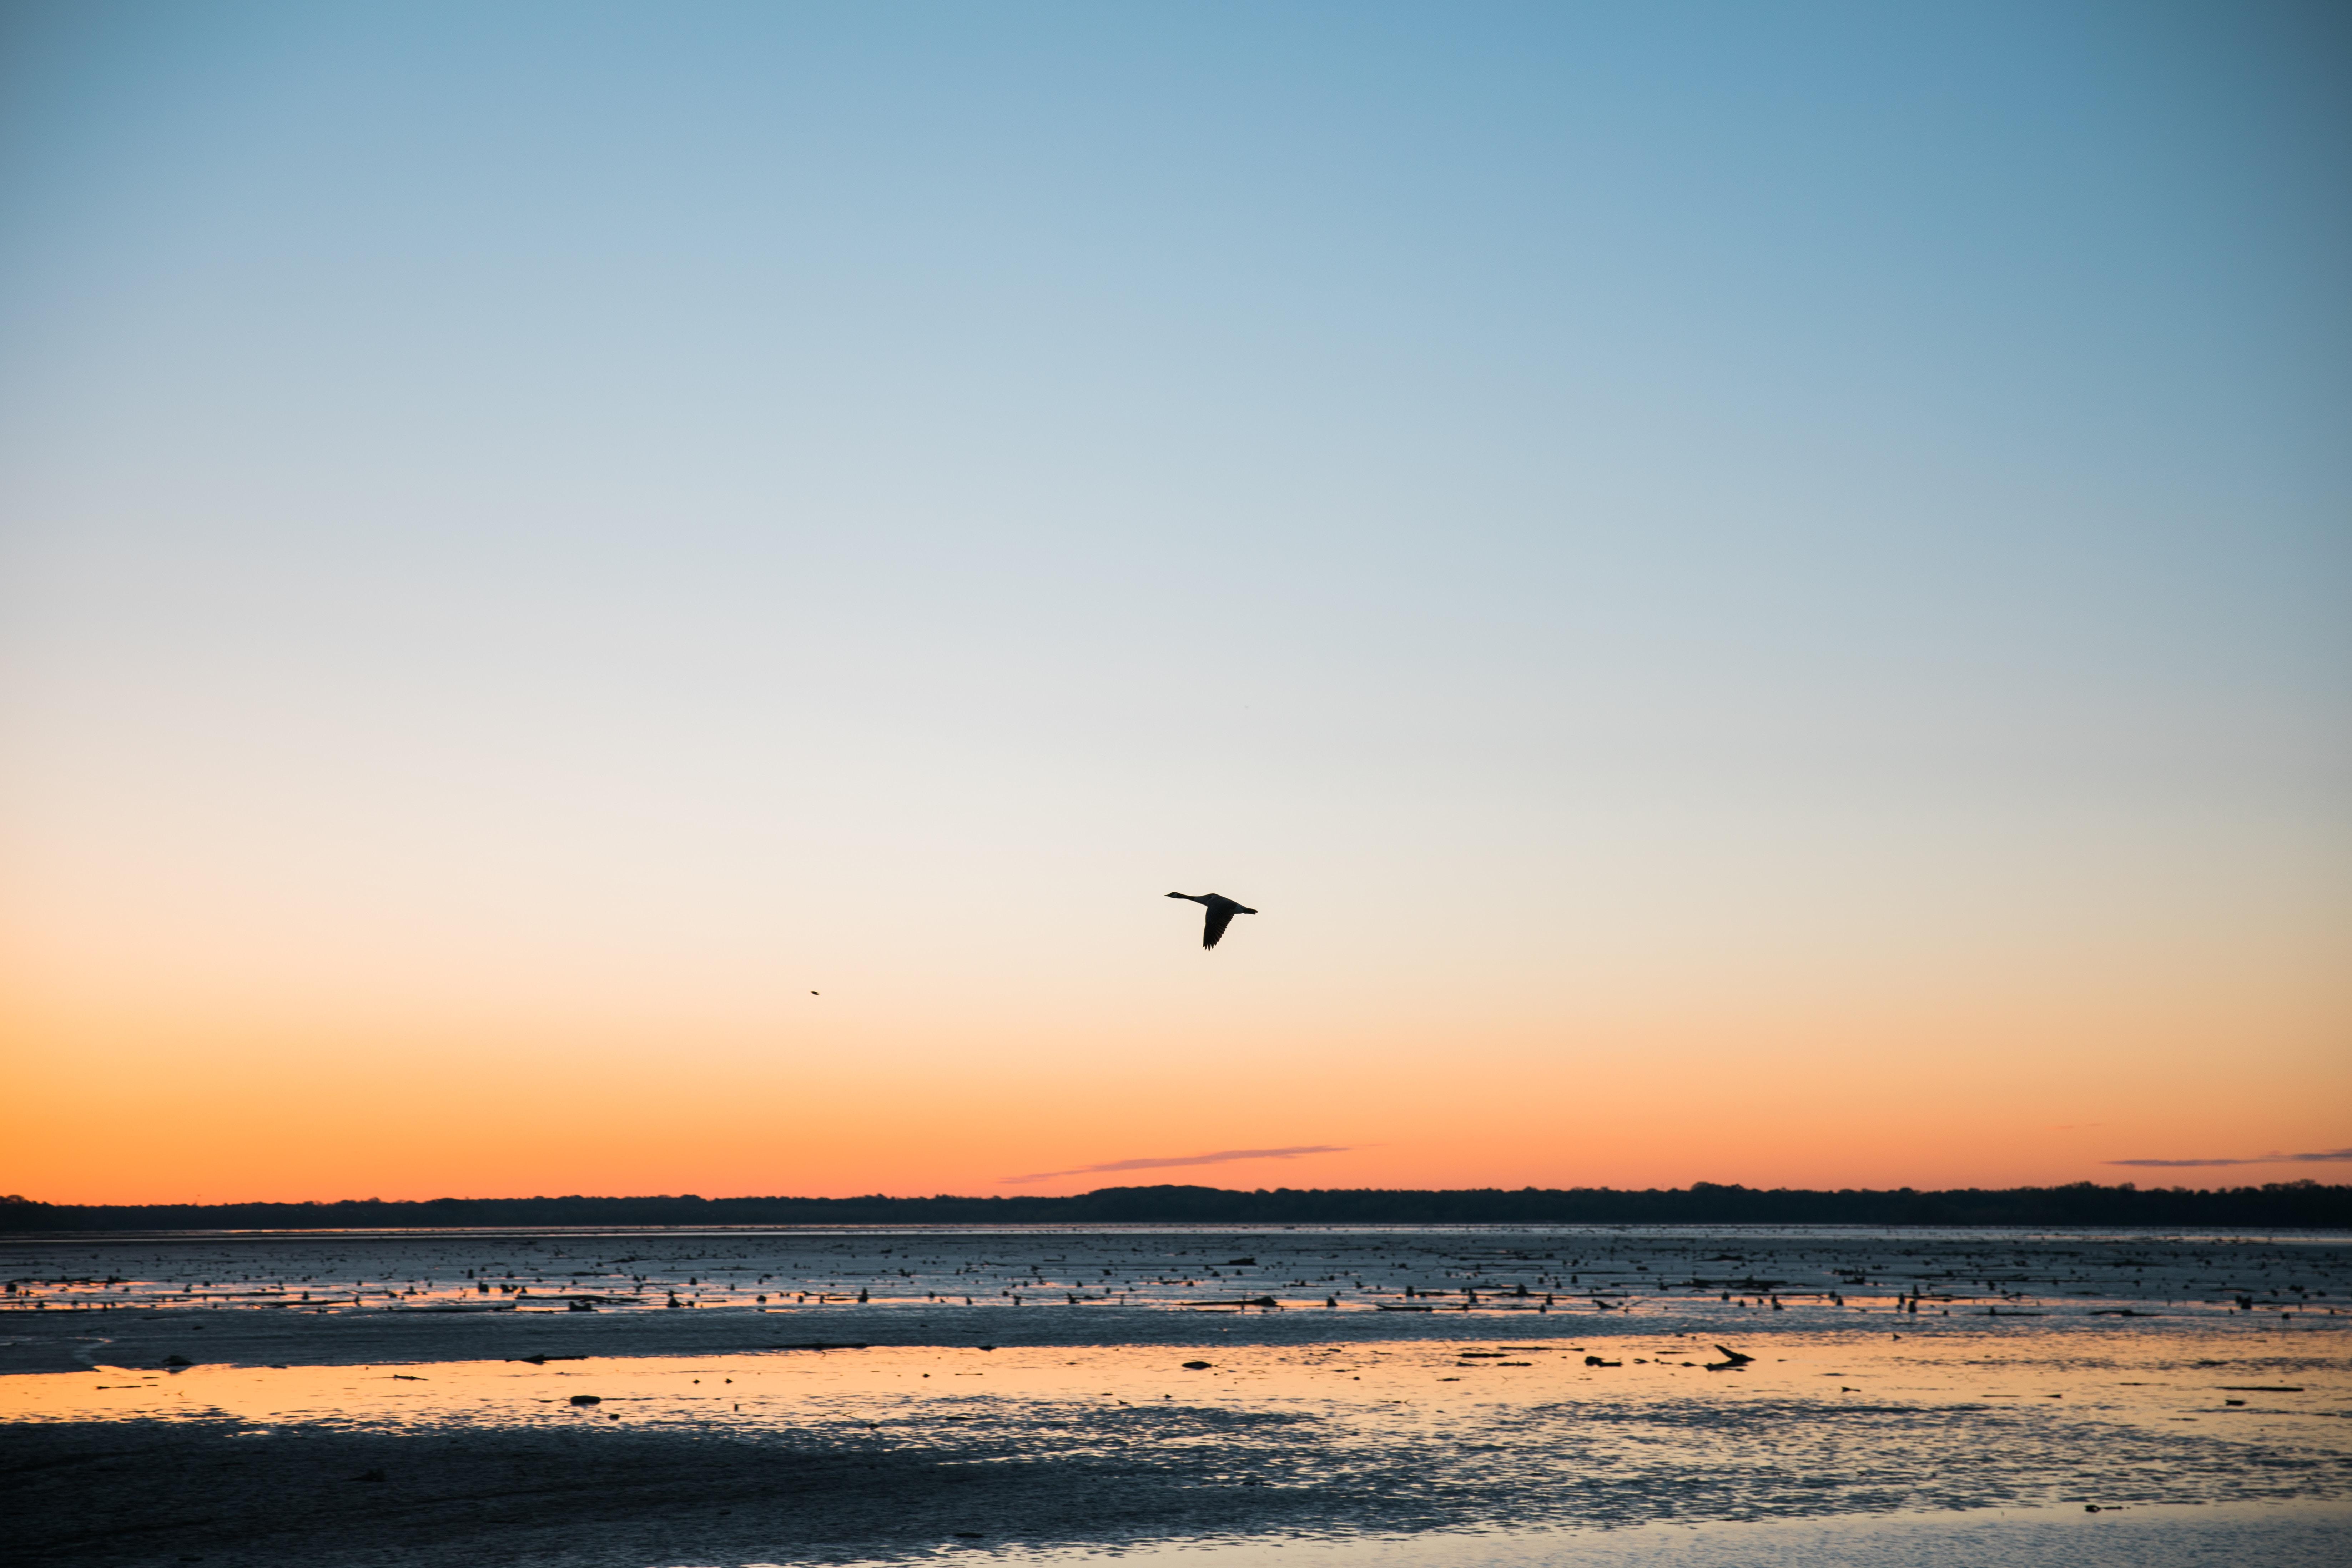 flying bird over body of water under blue sky